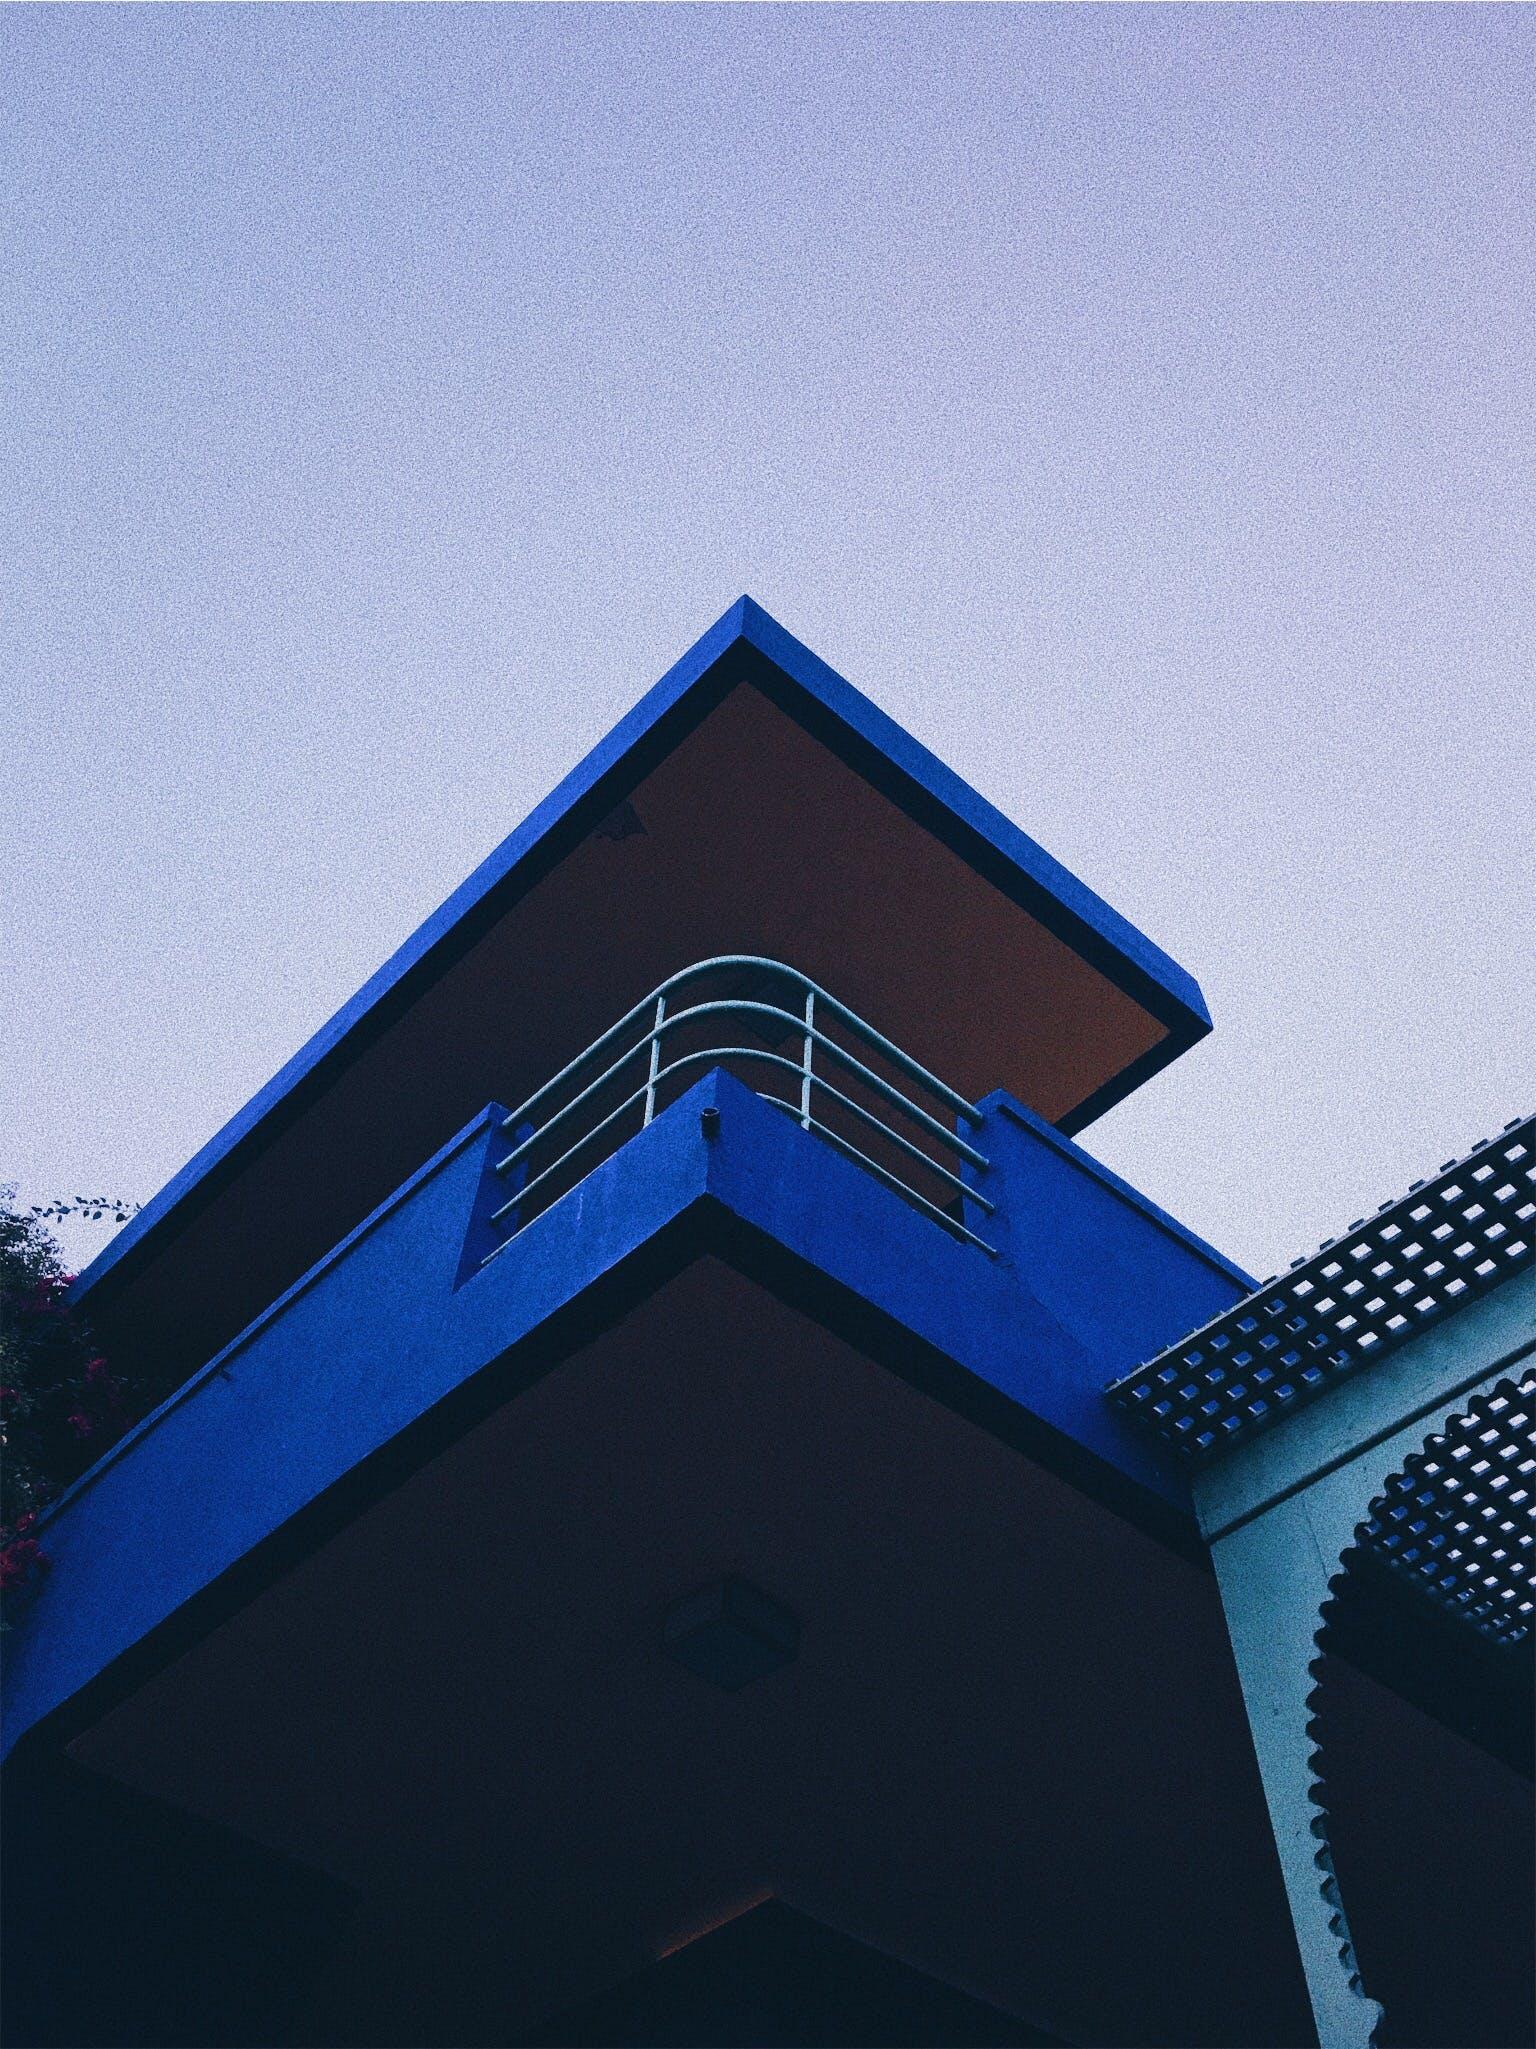 Gratis stockfoto met architectuur, bouw, futuristisch, gebouw